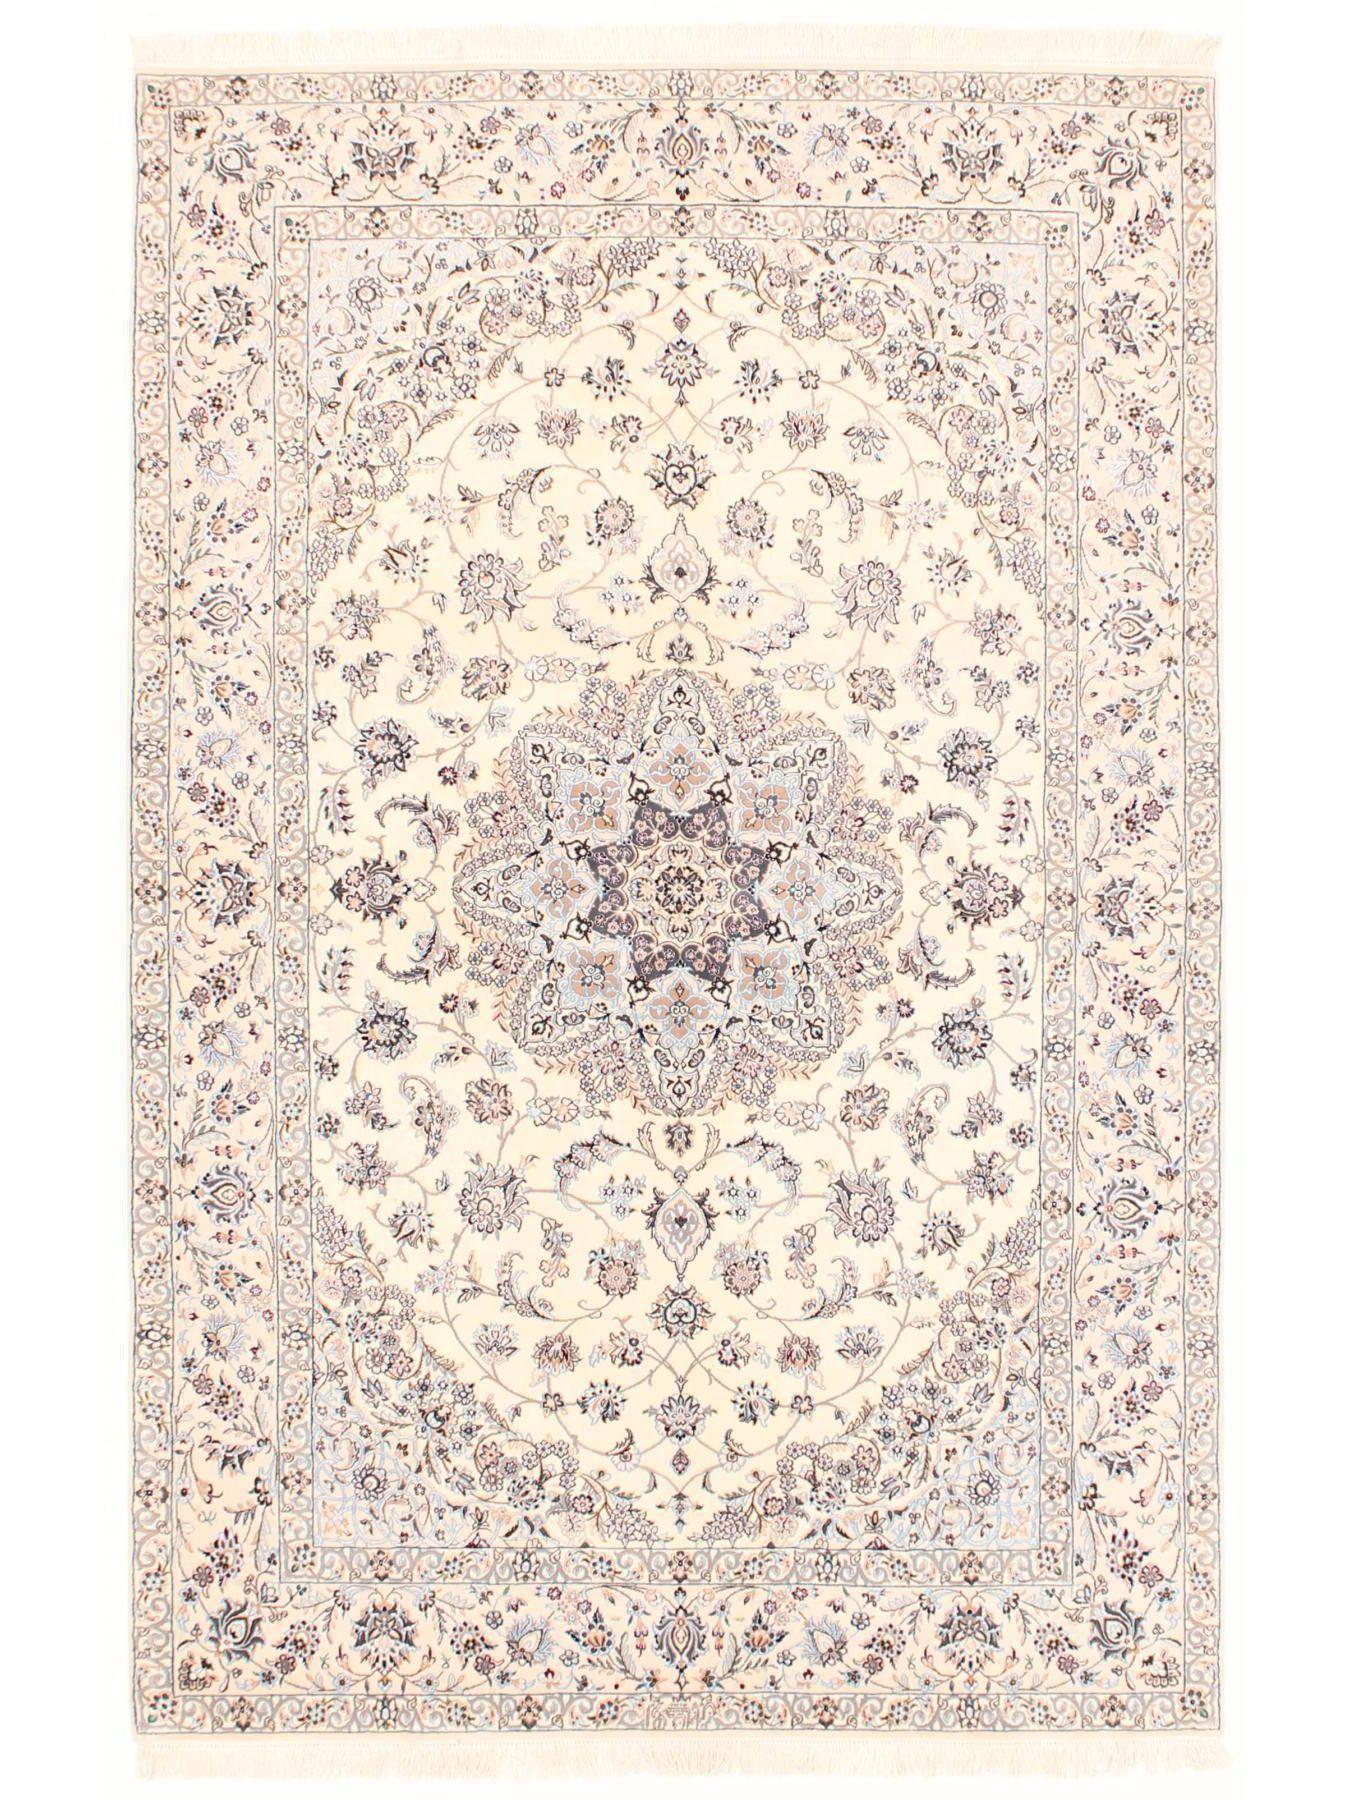 Tapis prestigieux - Nain 6la  Dimensions:233x152cm